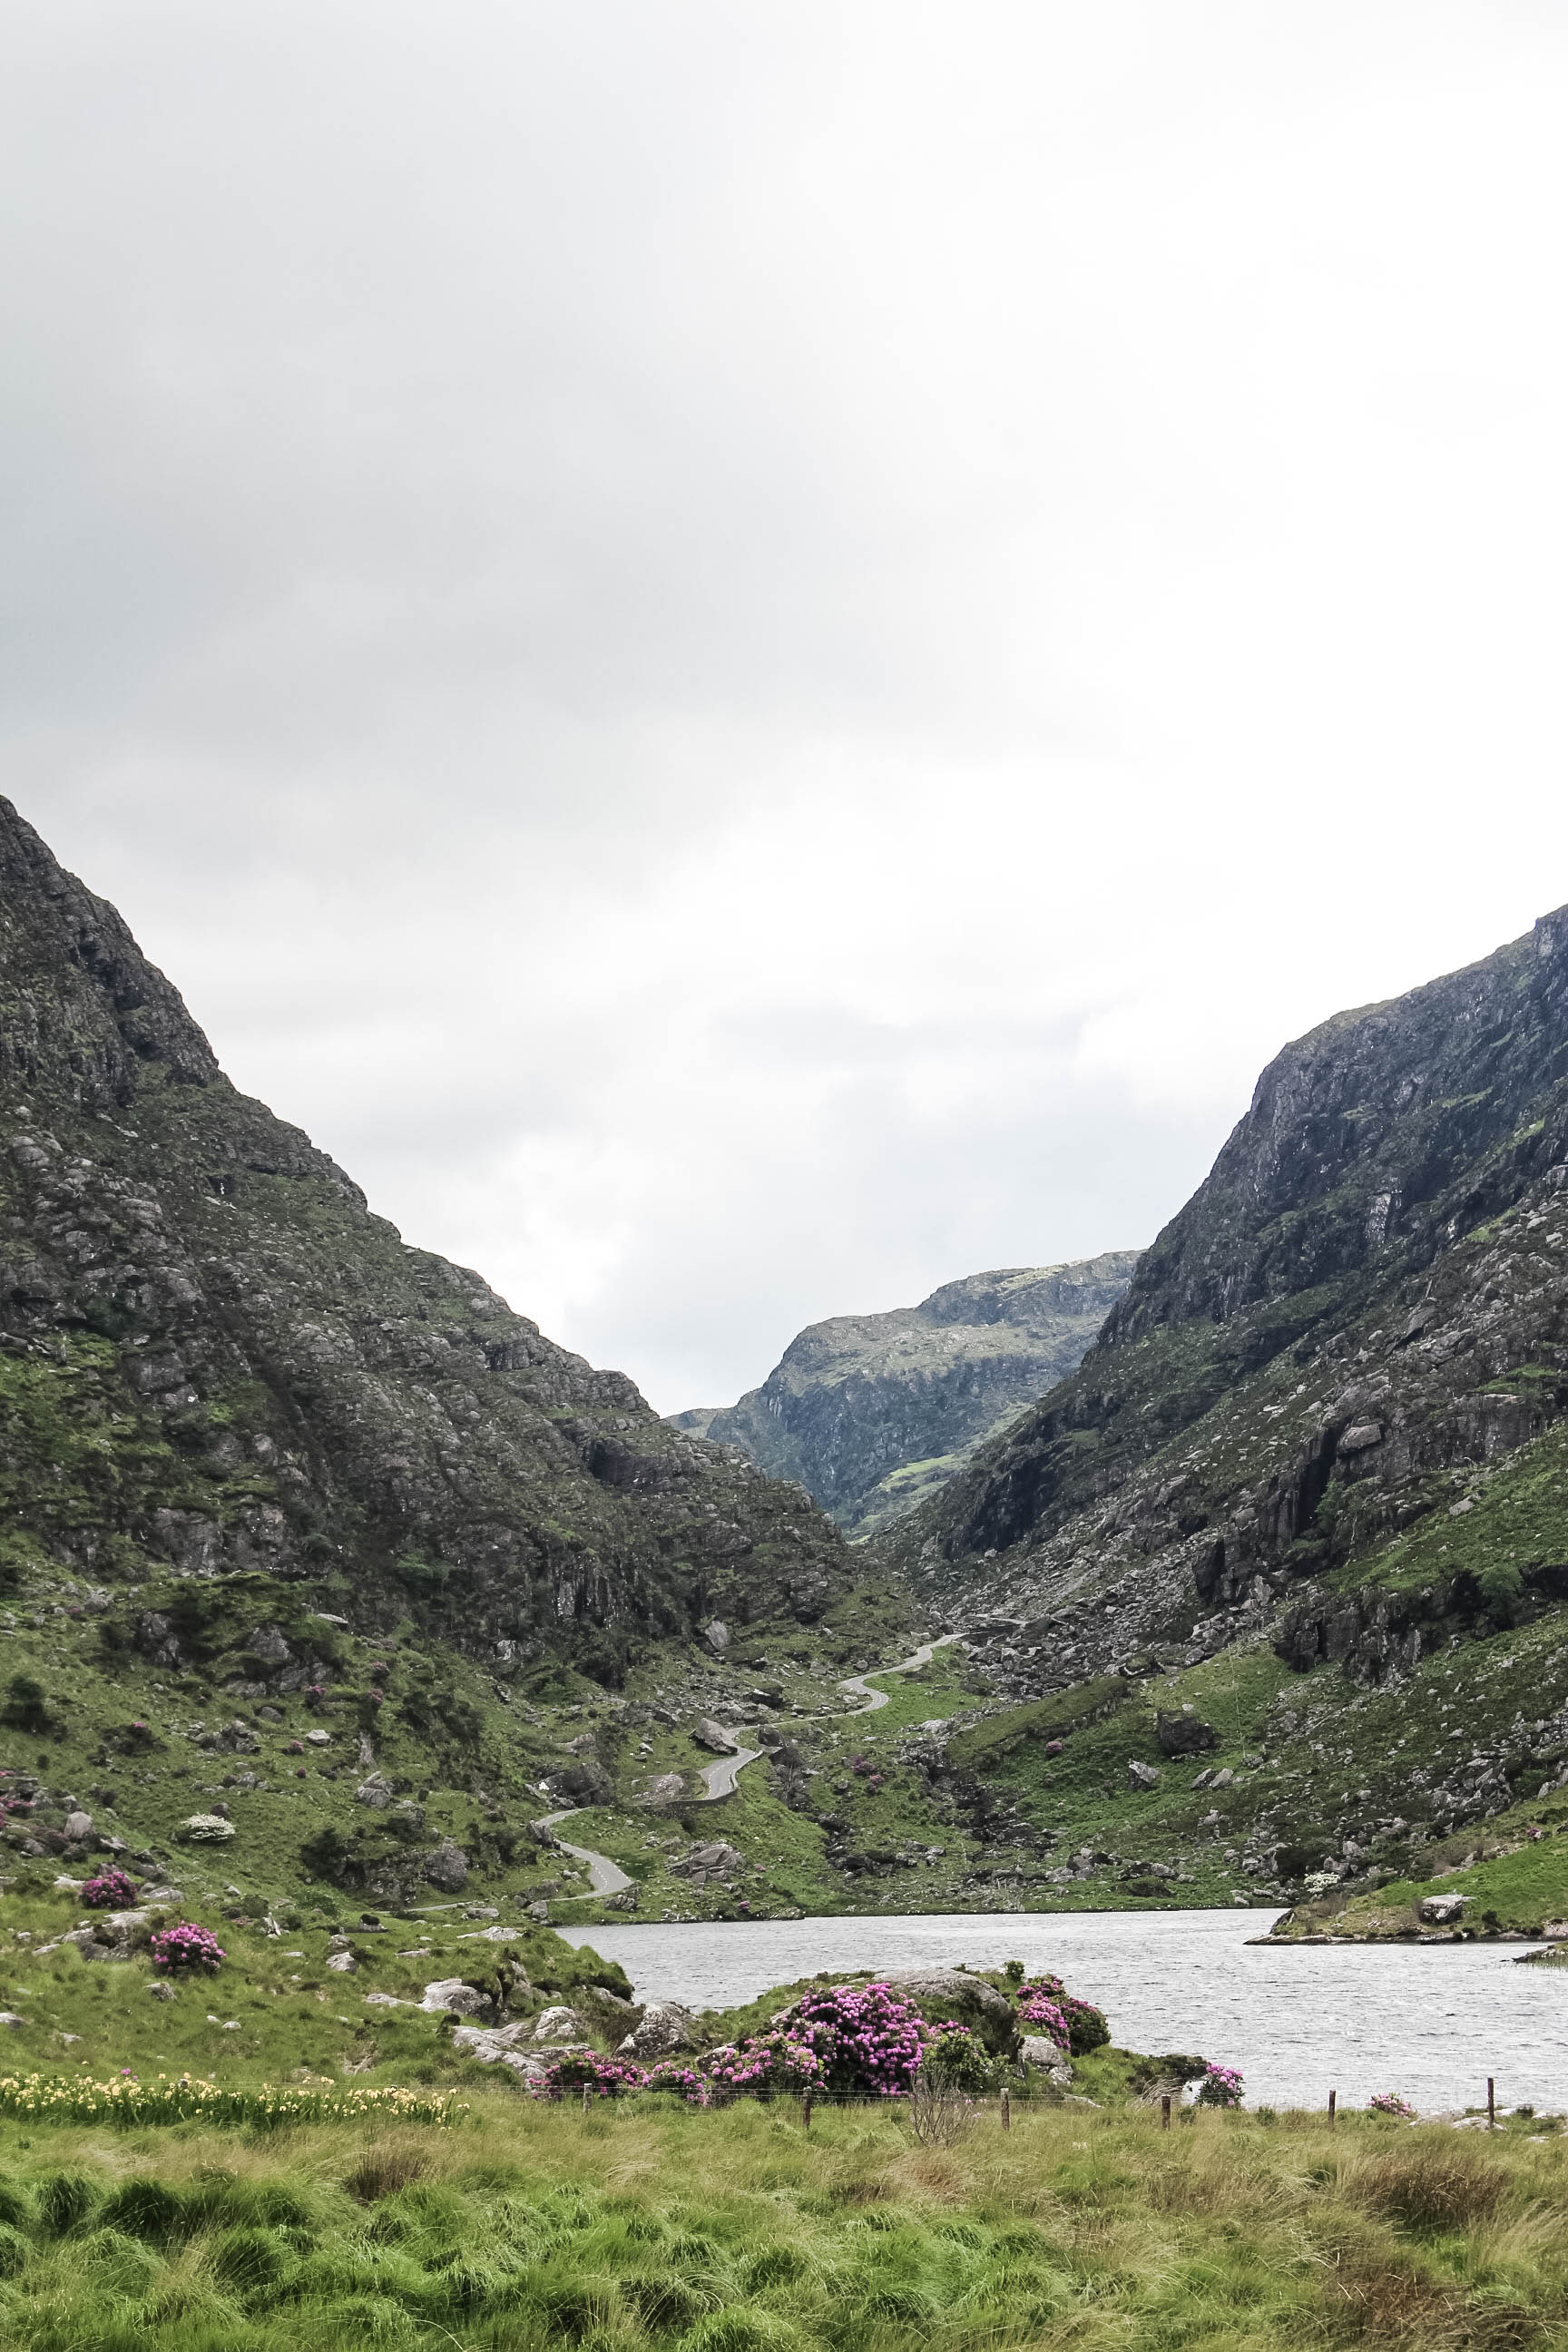 Gap of Dunloe near Killarney, Ireland - Things to do in Ireland - True North Paper Co. Blog